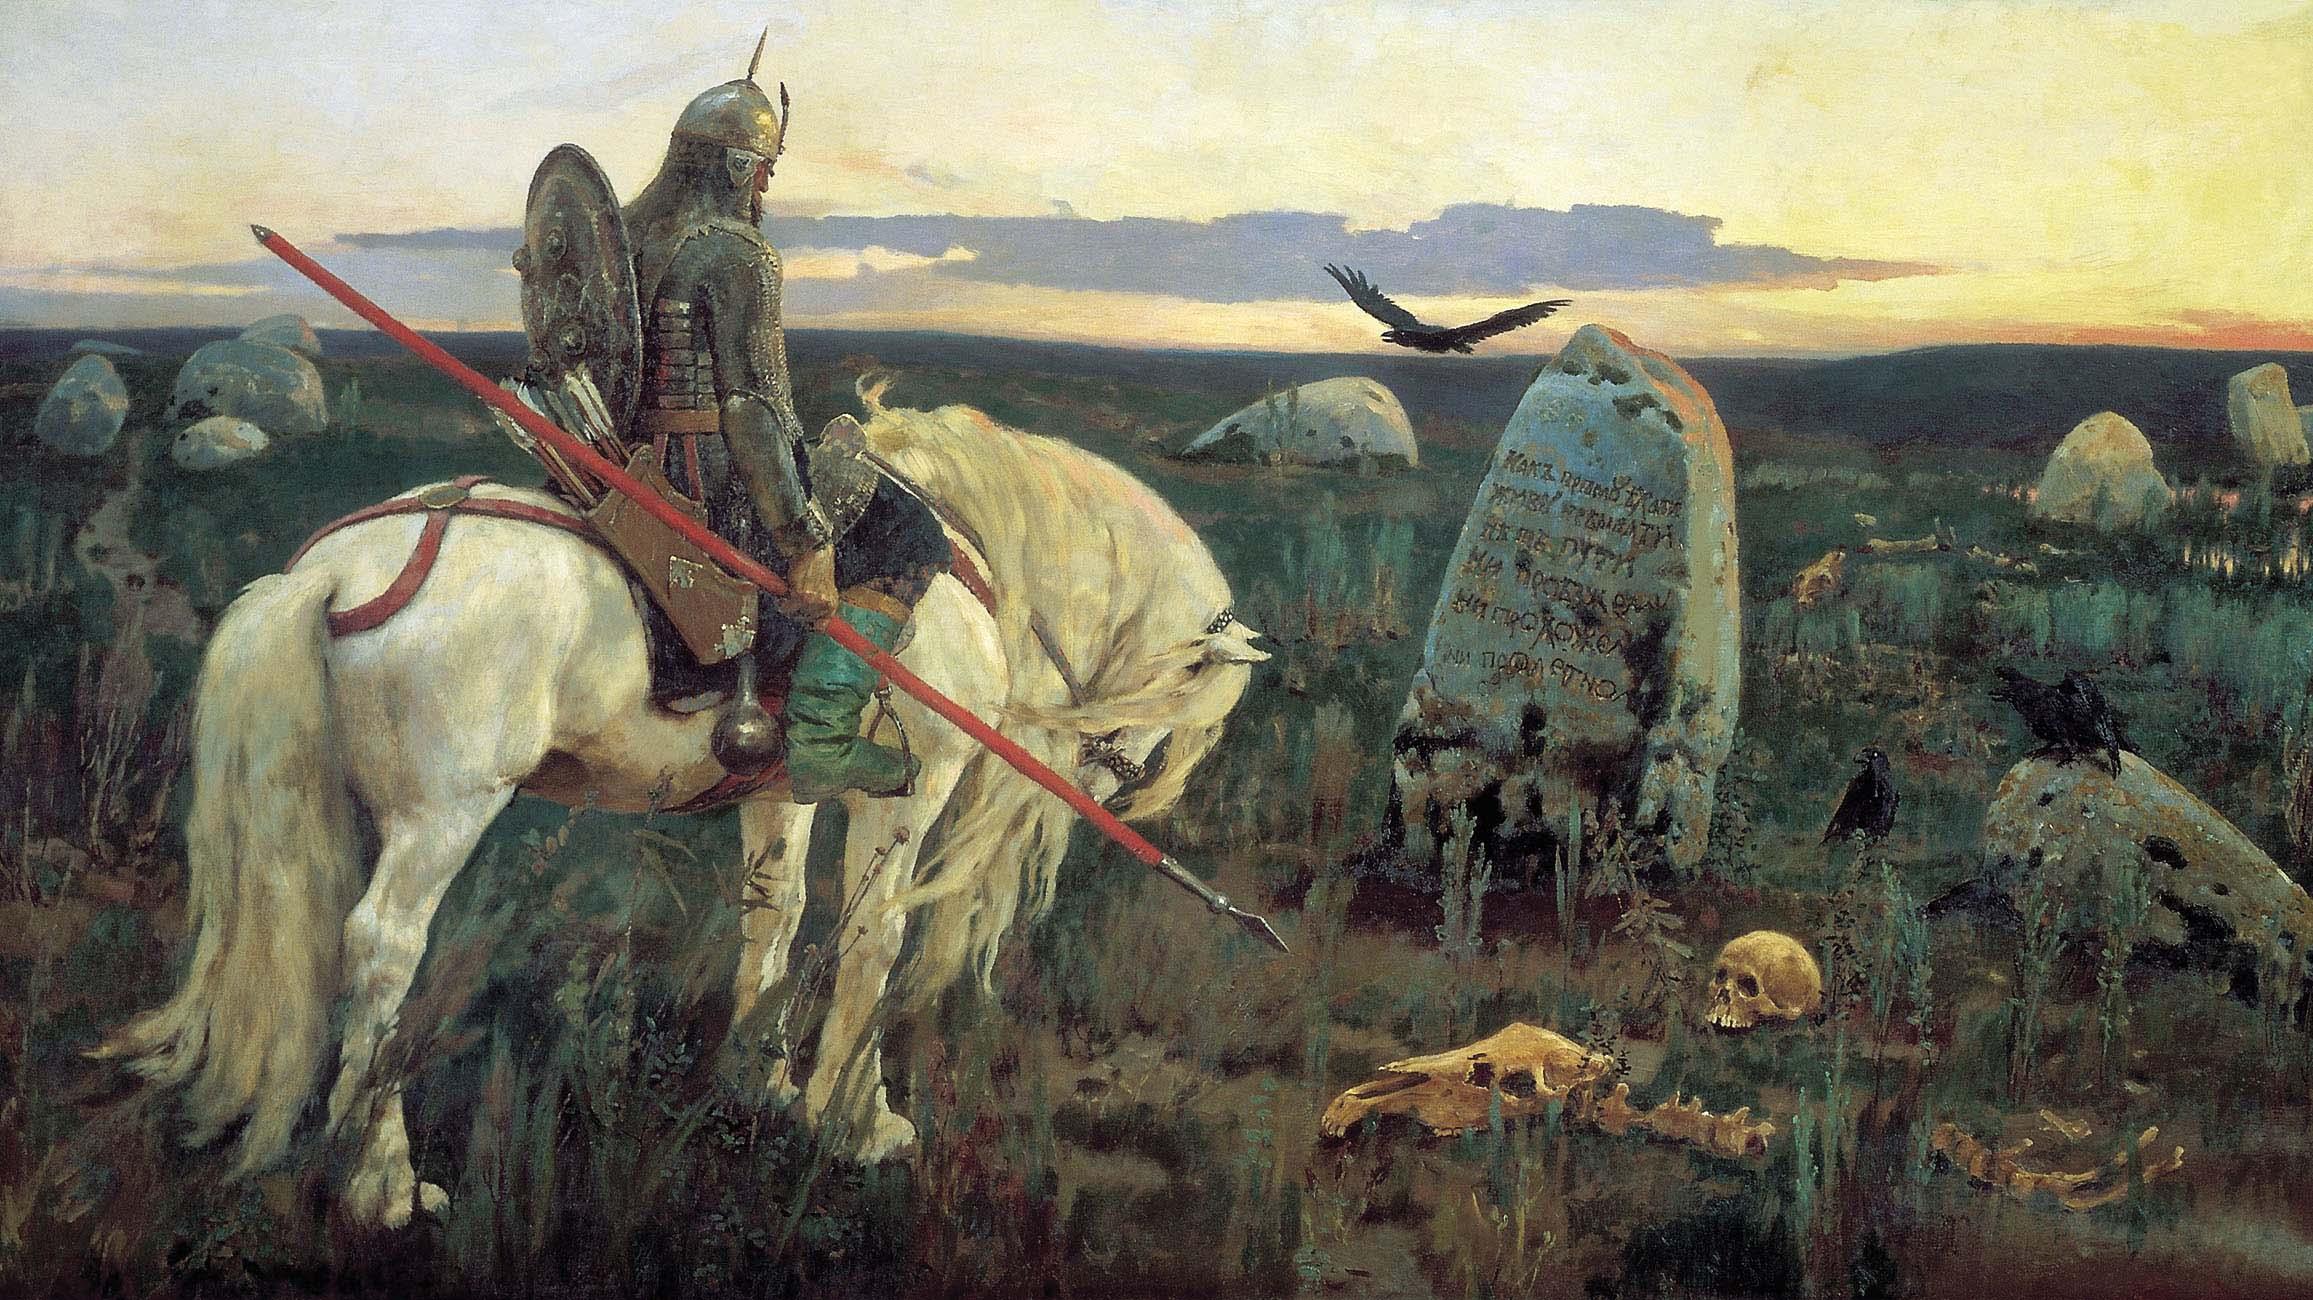 26099_klassika_vasnecov-viktor-mixajlovich_vityaz-na_2313x1300_(www.GdeFon.ru)